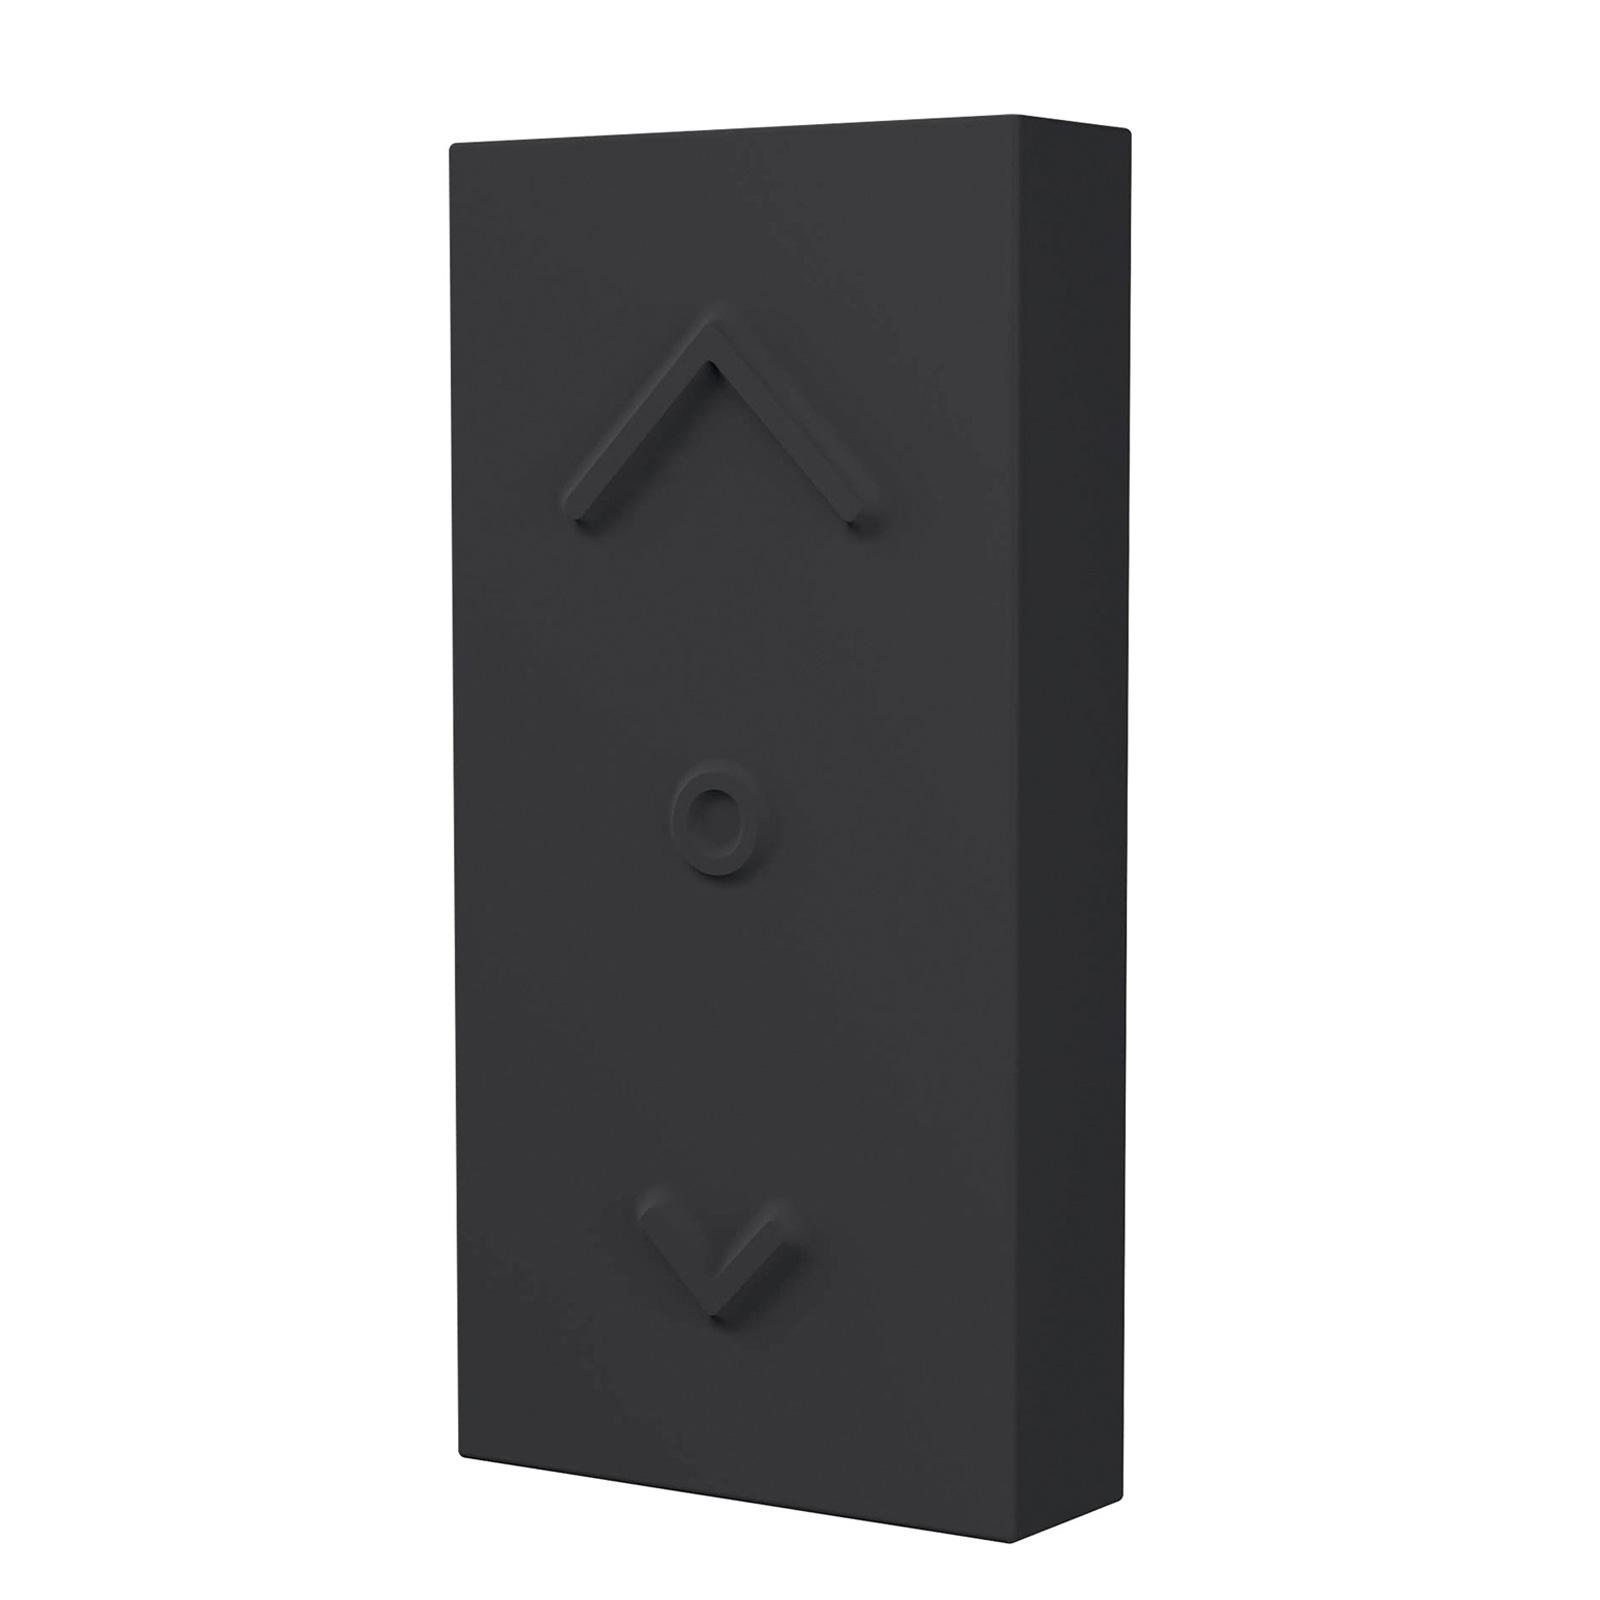 LEDVANCE SMART+ ZigBee Switch Mini_6106221_1